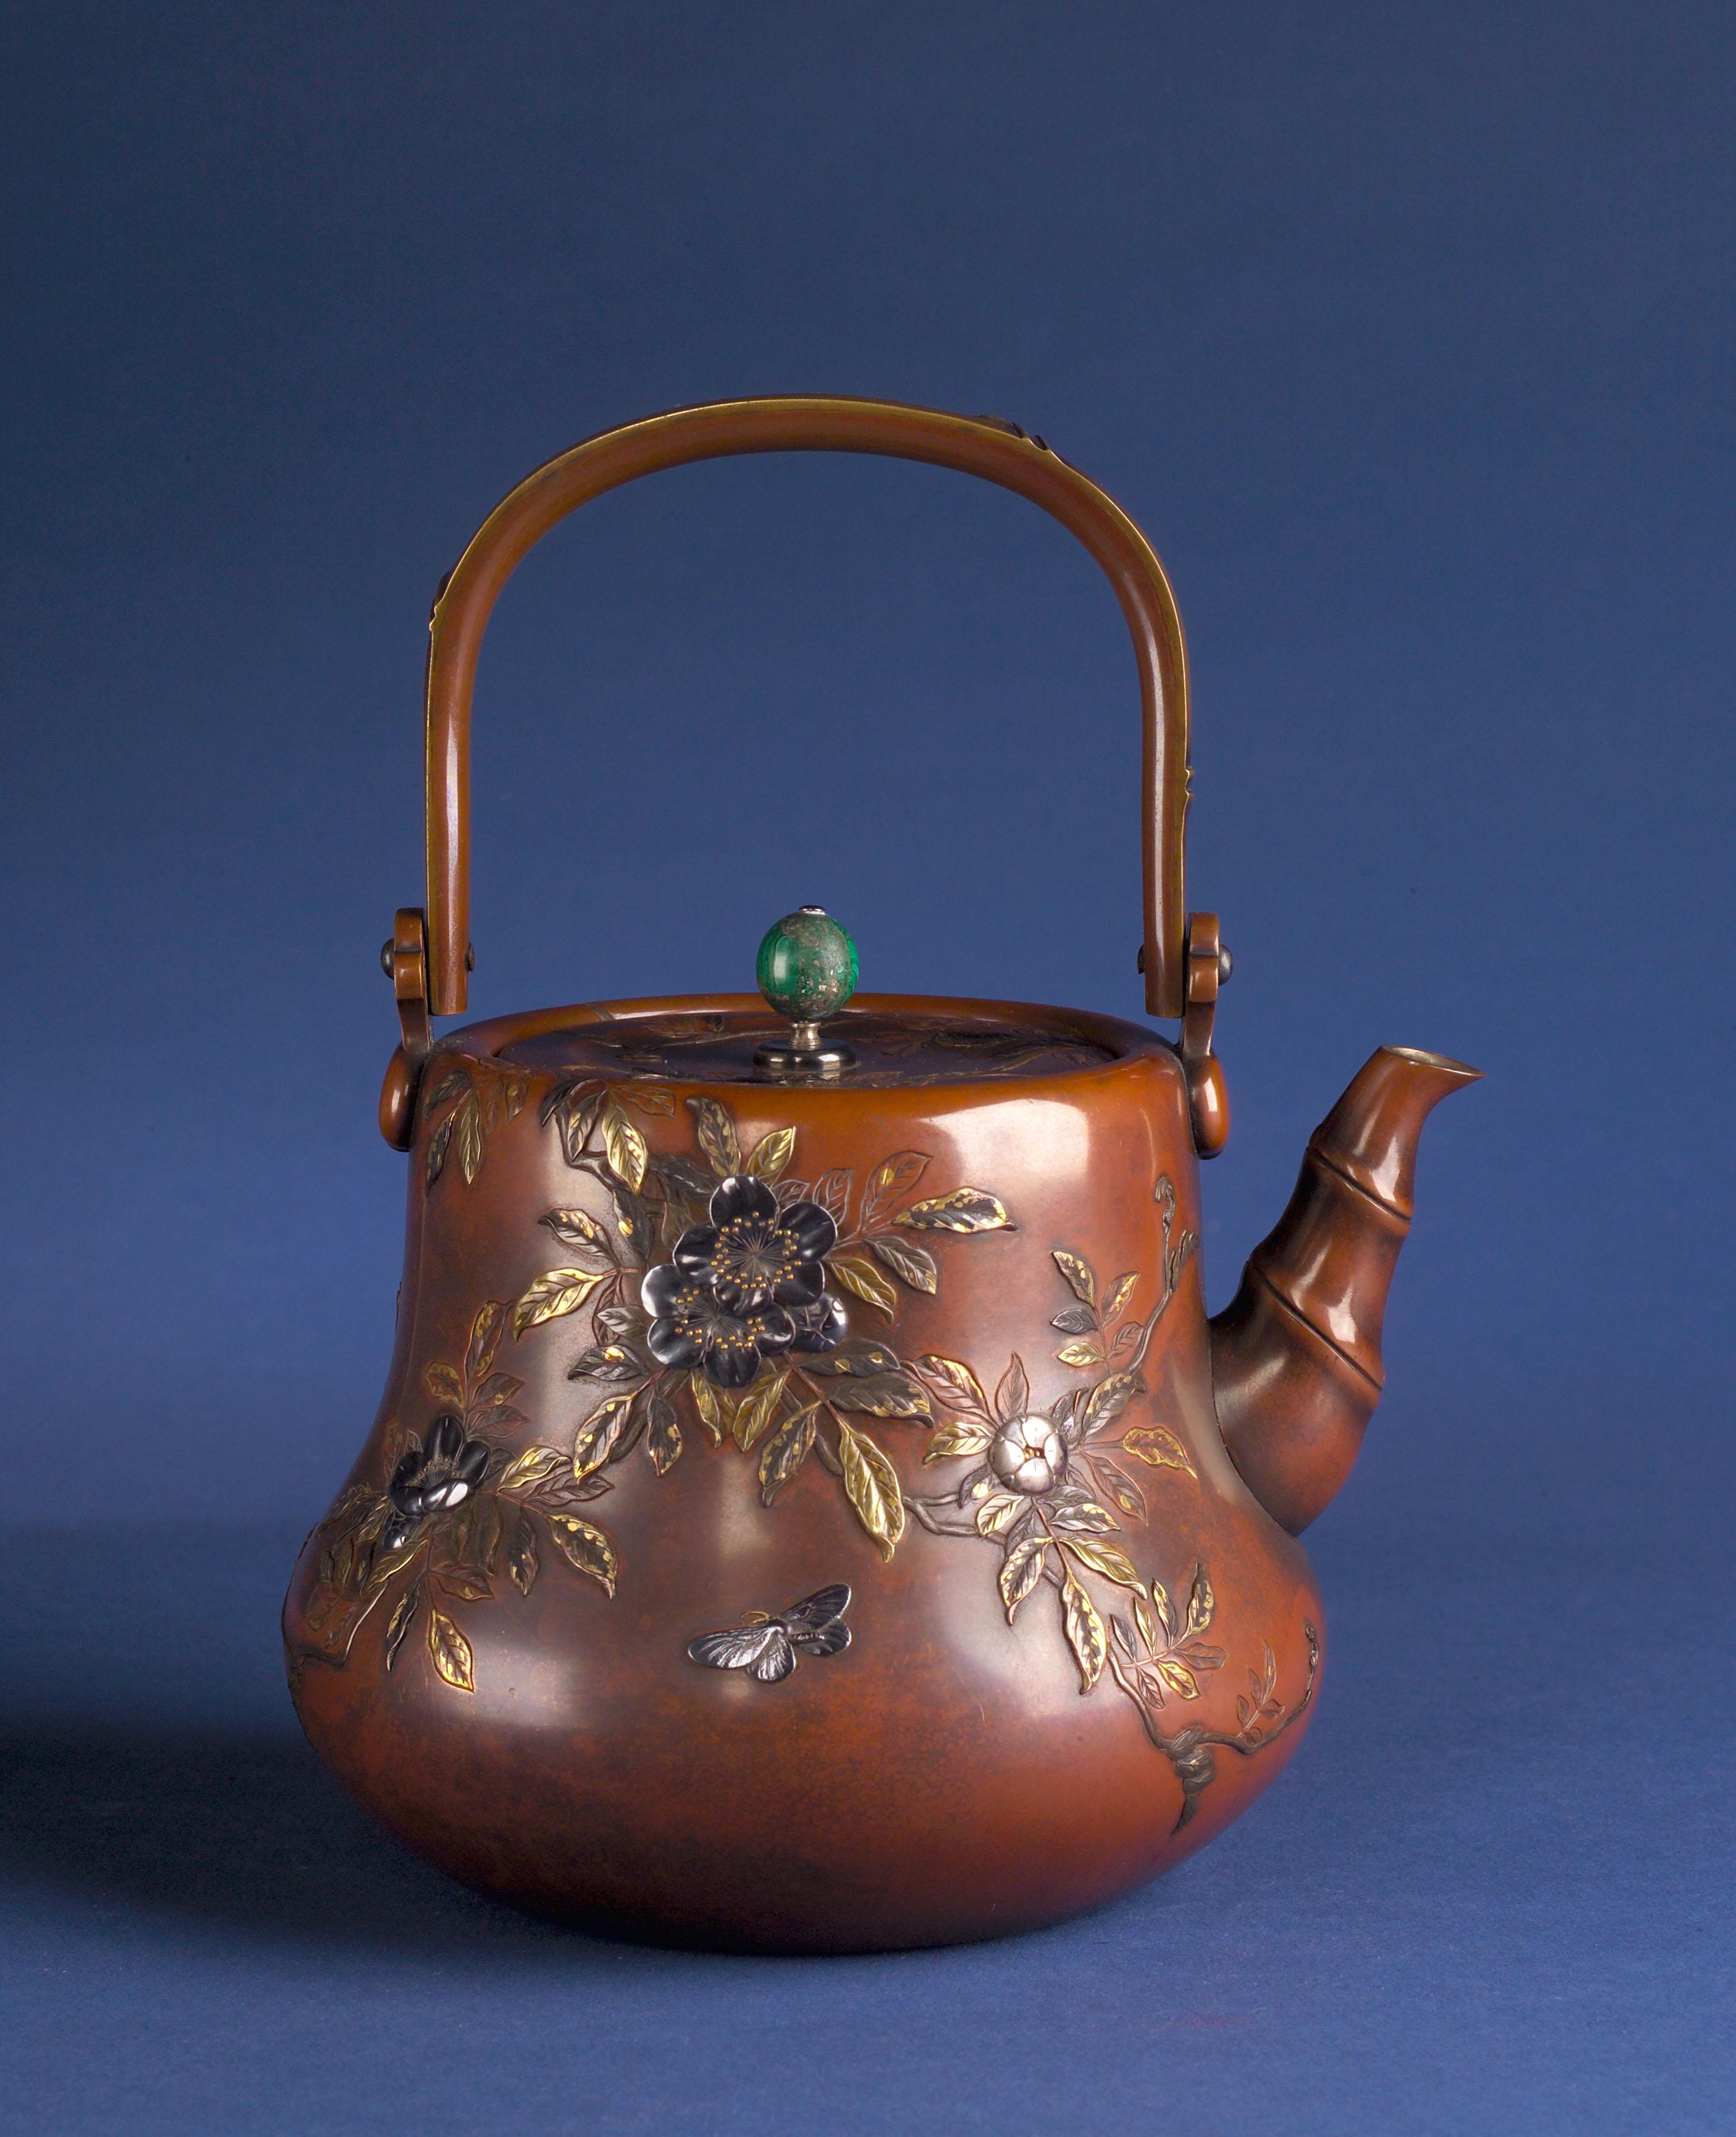 Teapot by Jomi Of Kyoto